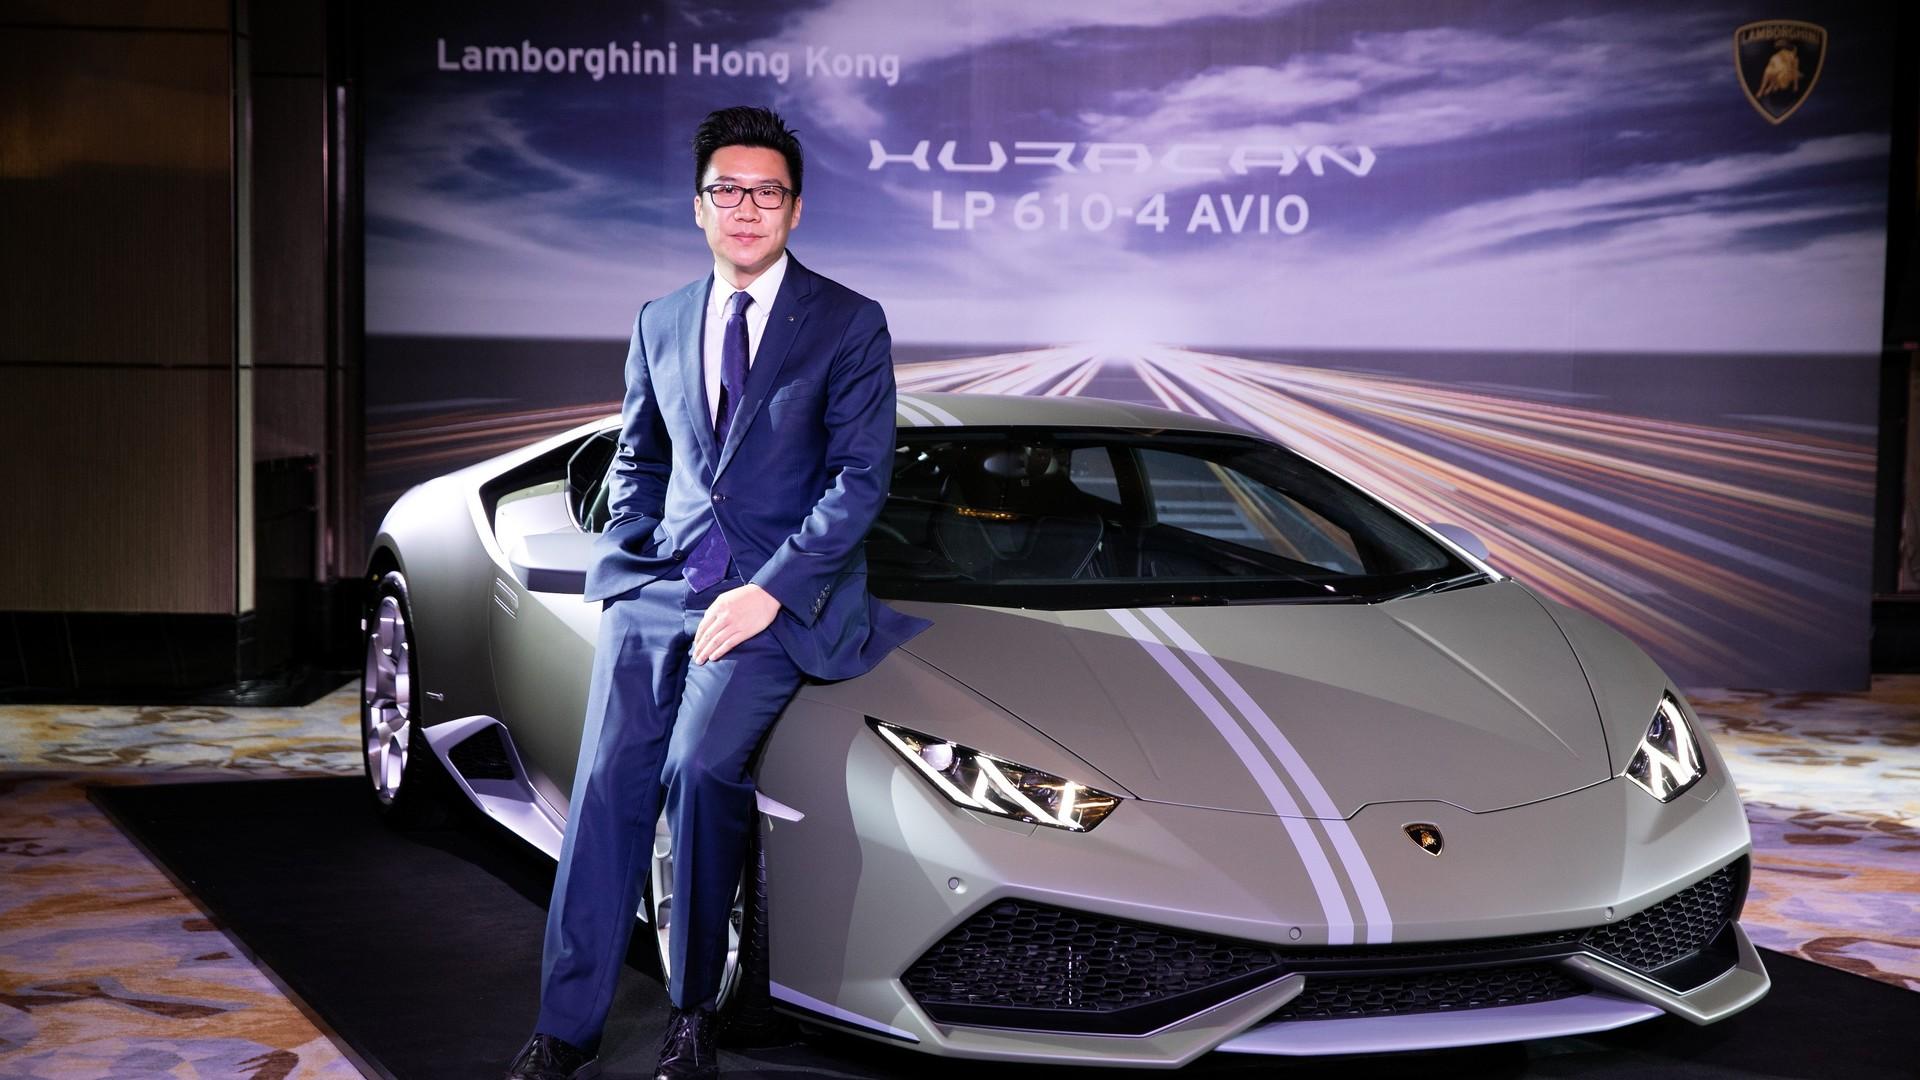 Lamborghini Huracan Avio Launches In Hong Kong At Hk 4 48m